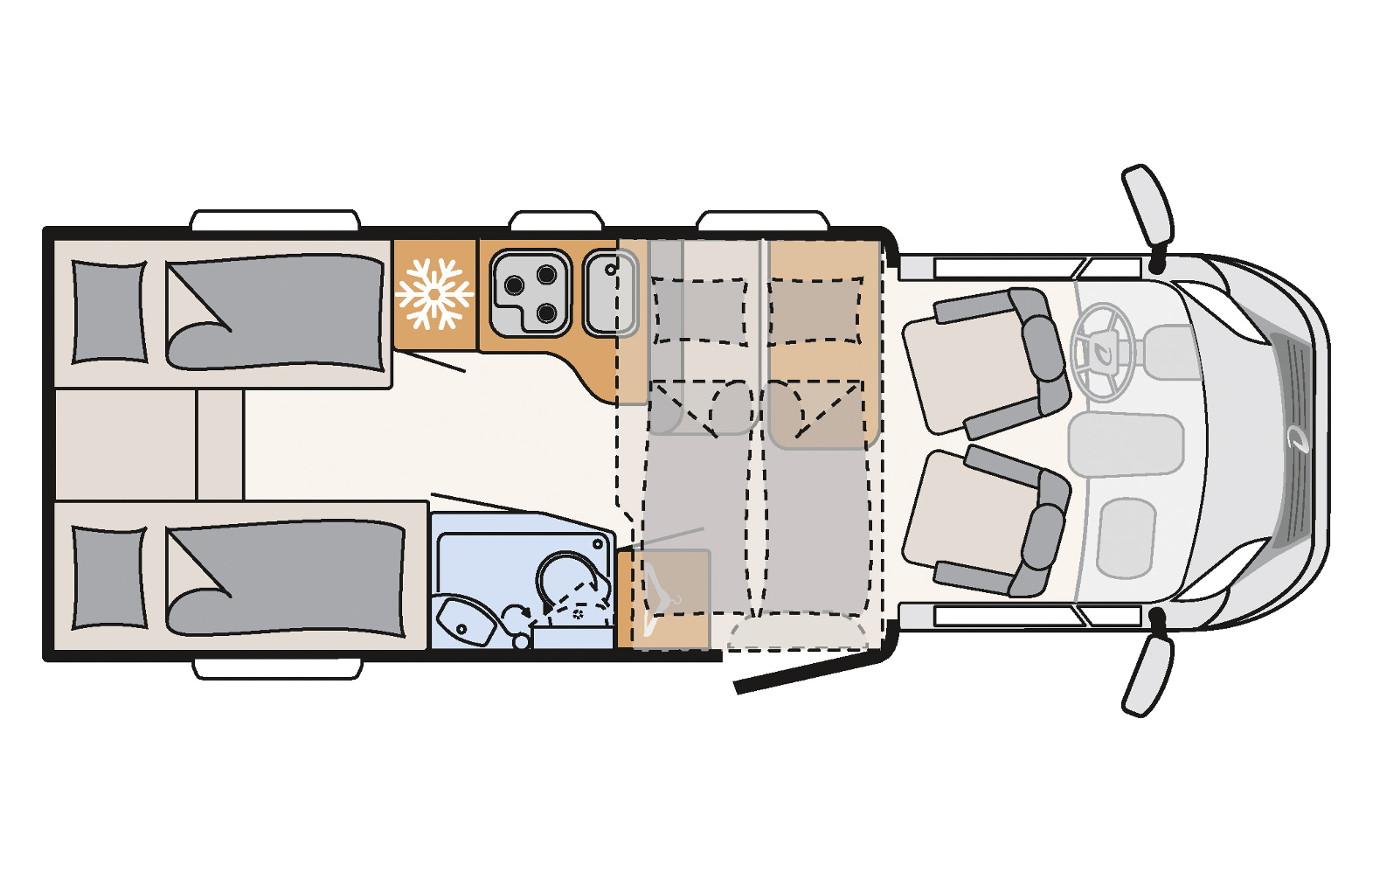 Mietwohnmobil Dethleffs Trend - Grundriss